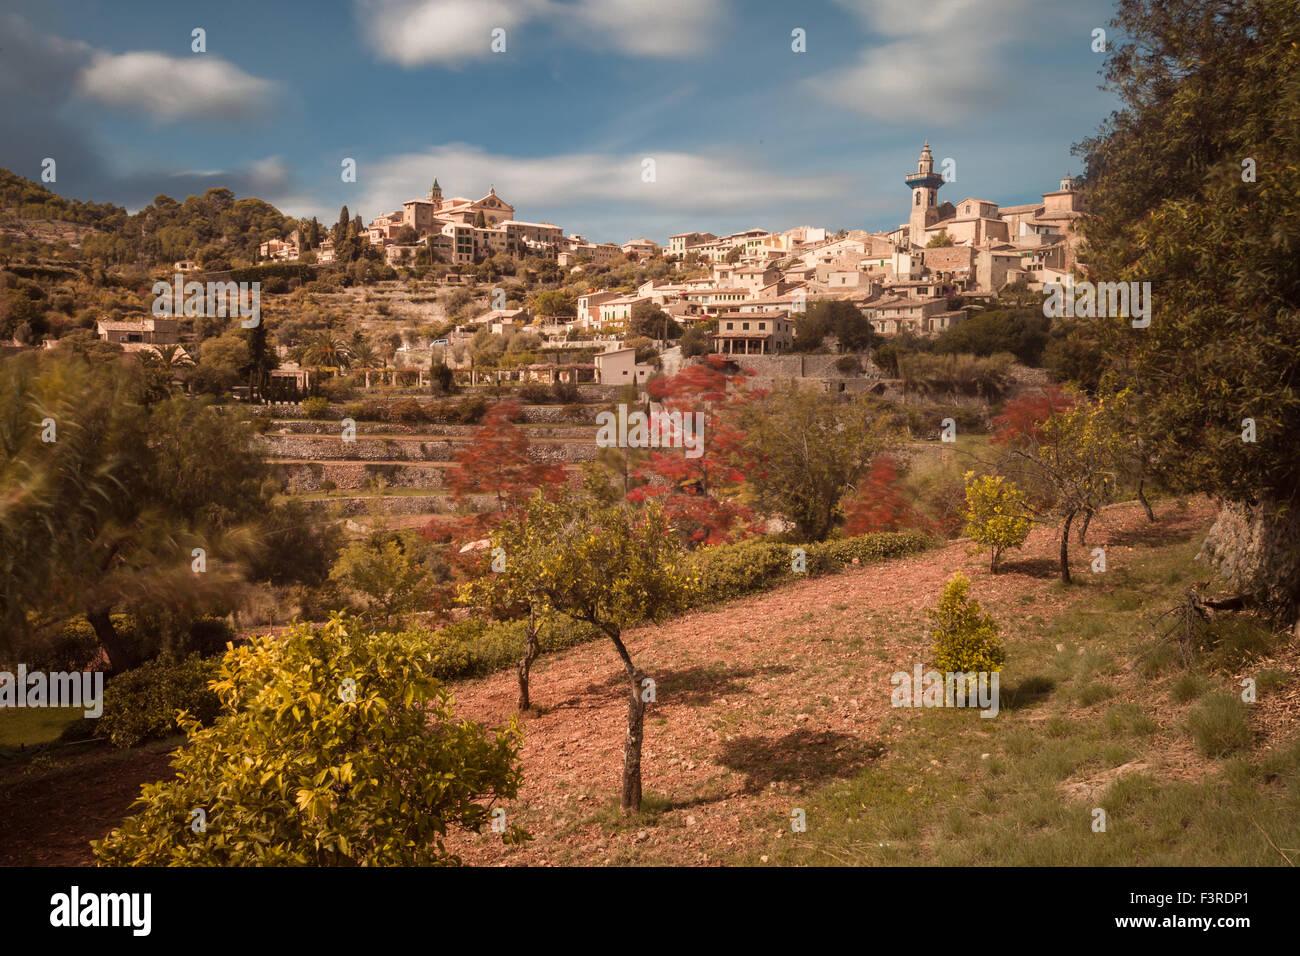 Valldemossa, a village and municipality on the island of Majorca, Spain - Stock Image